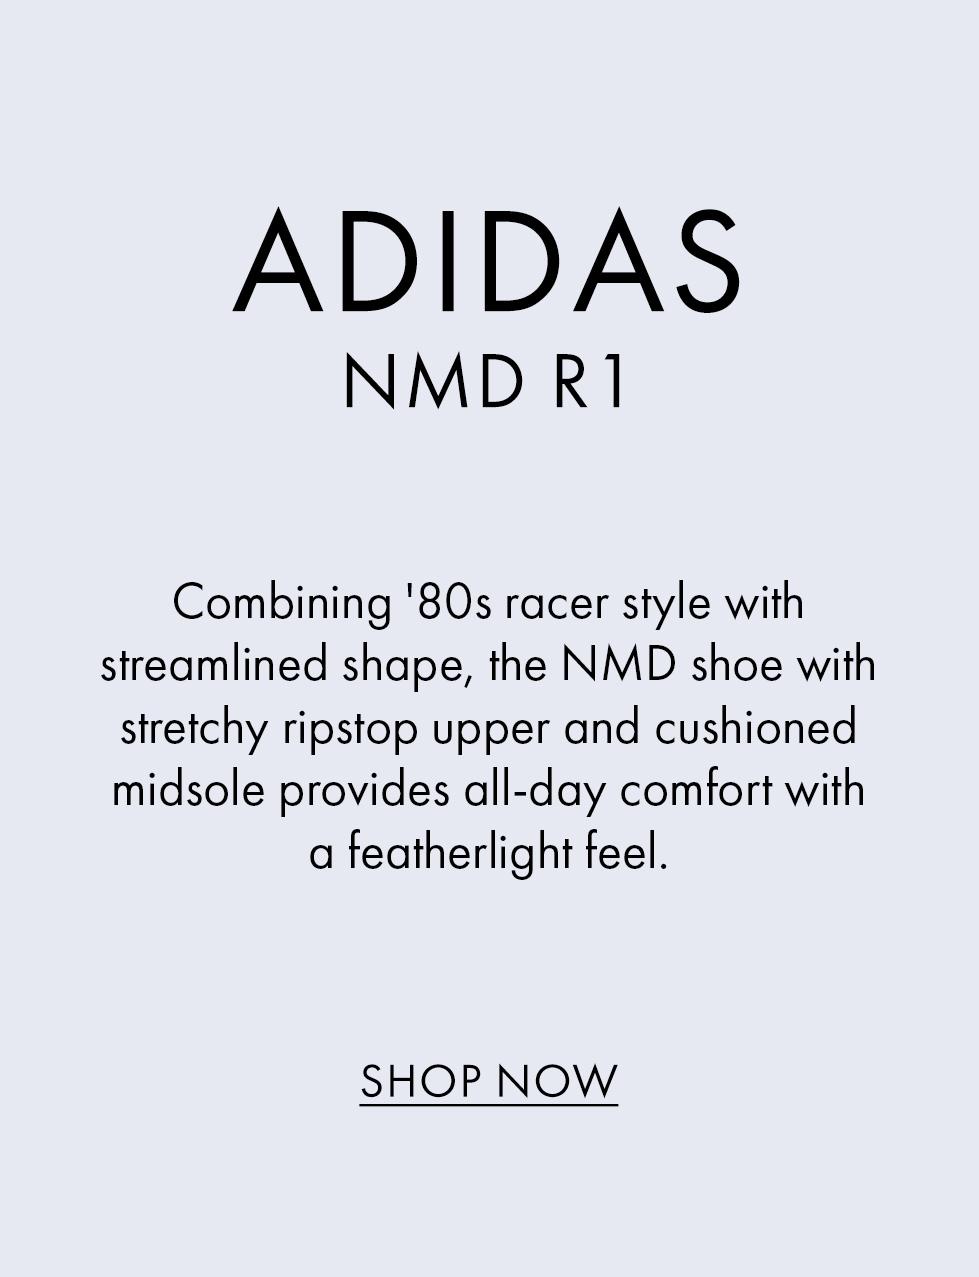 W38_6A_athleisure_m_carousel_adidas_left_en